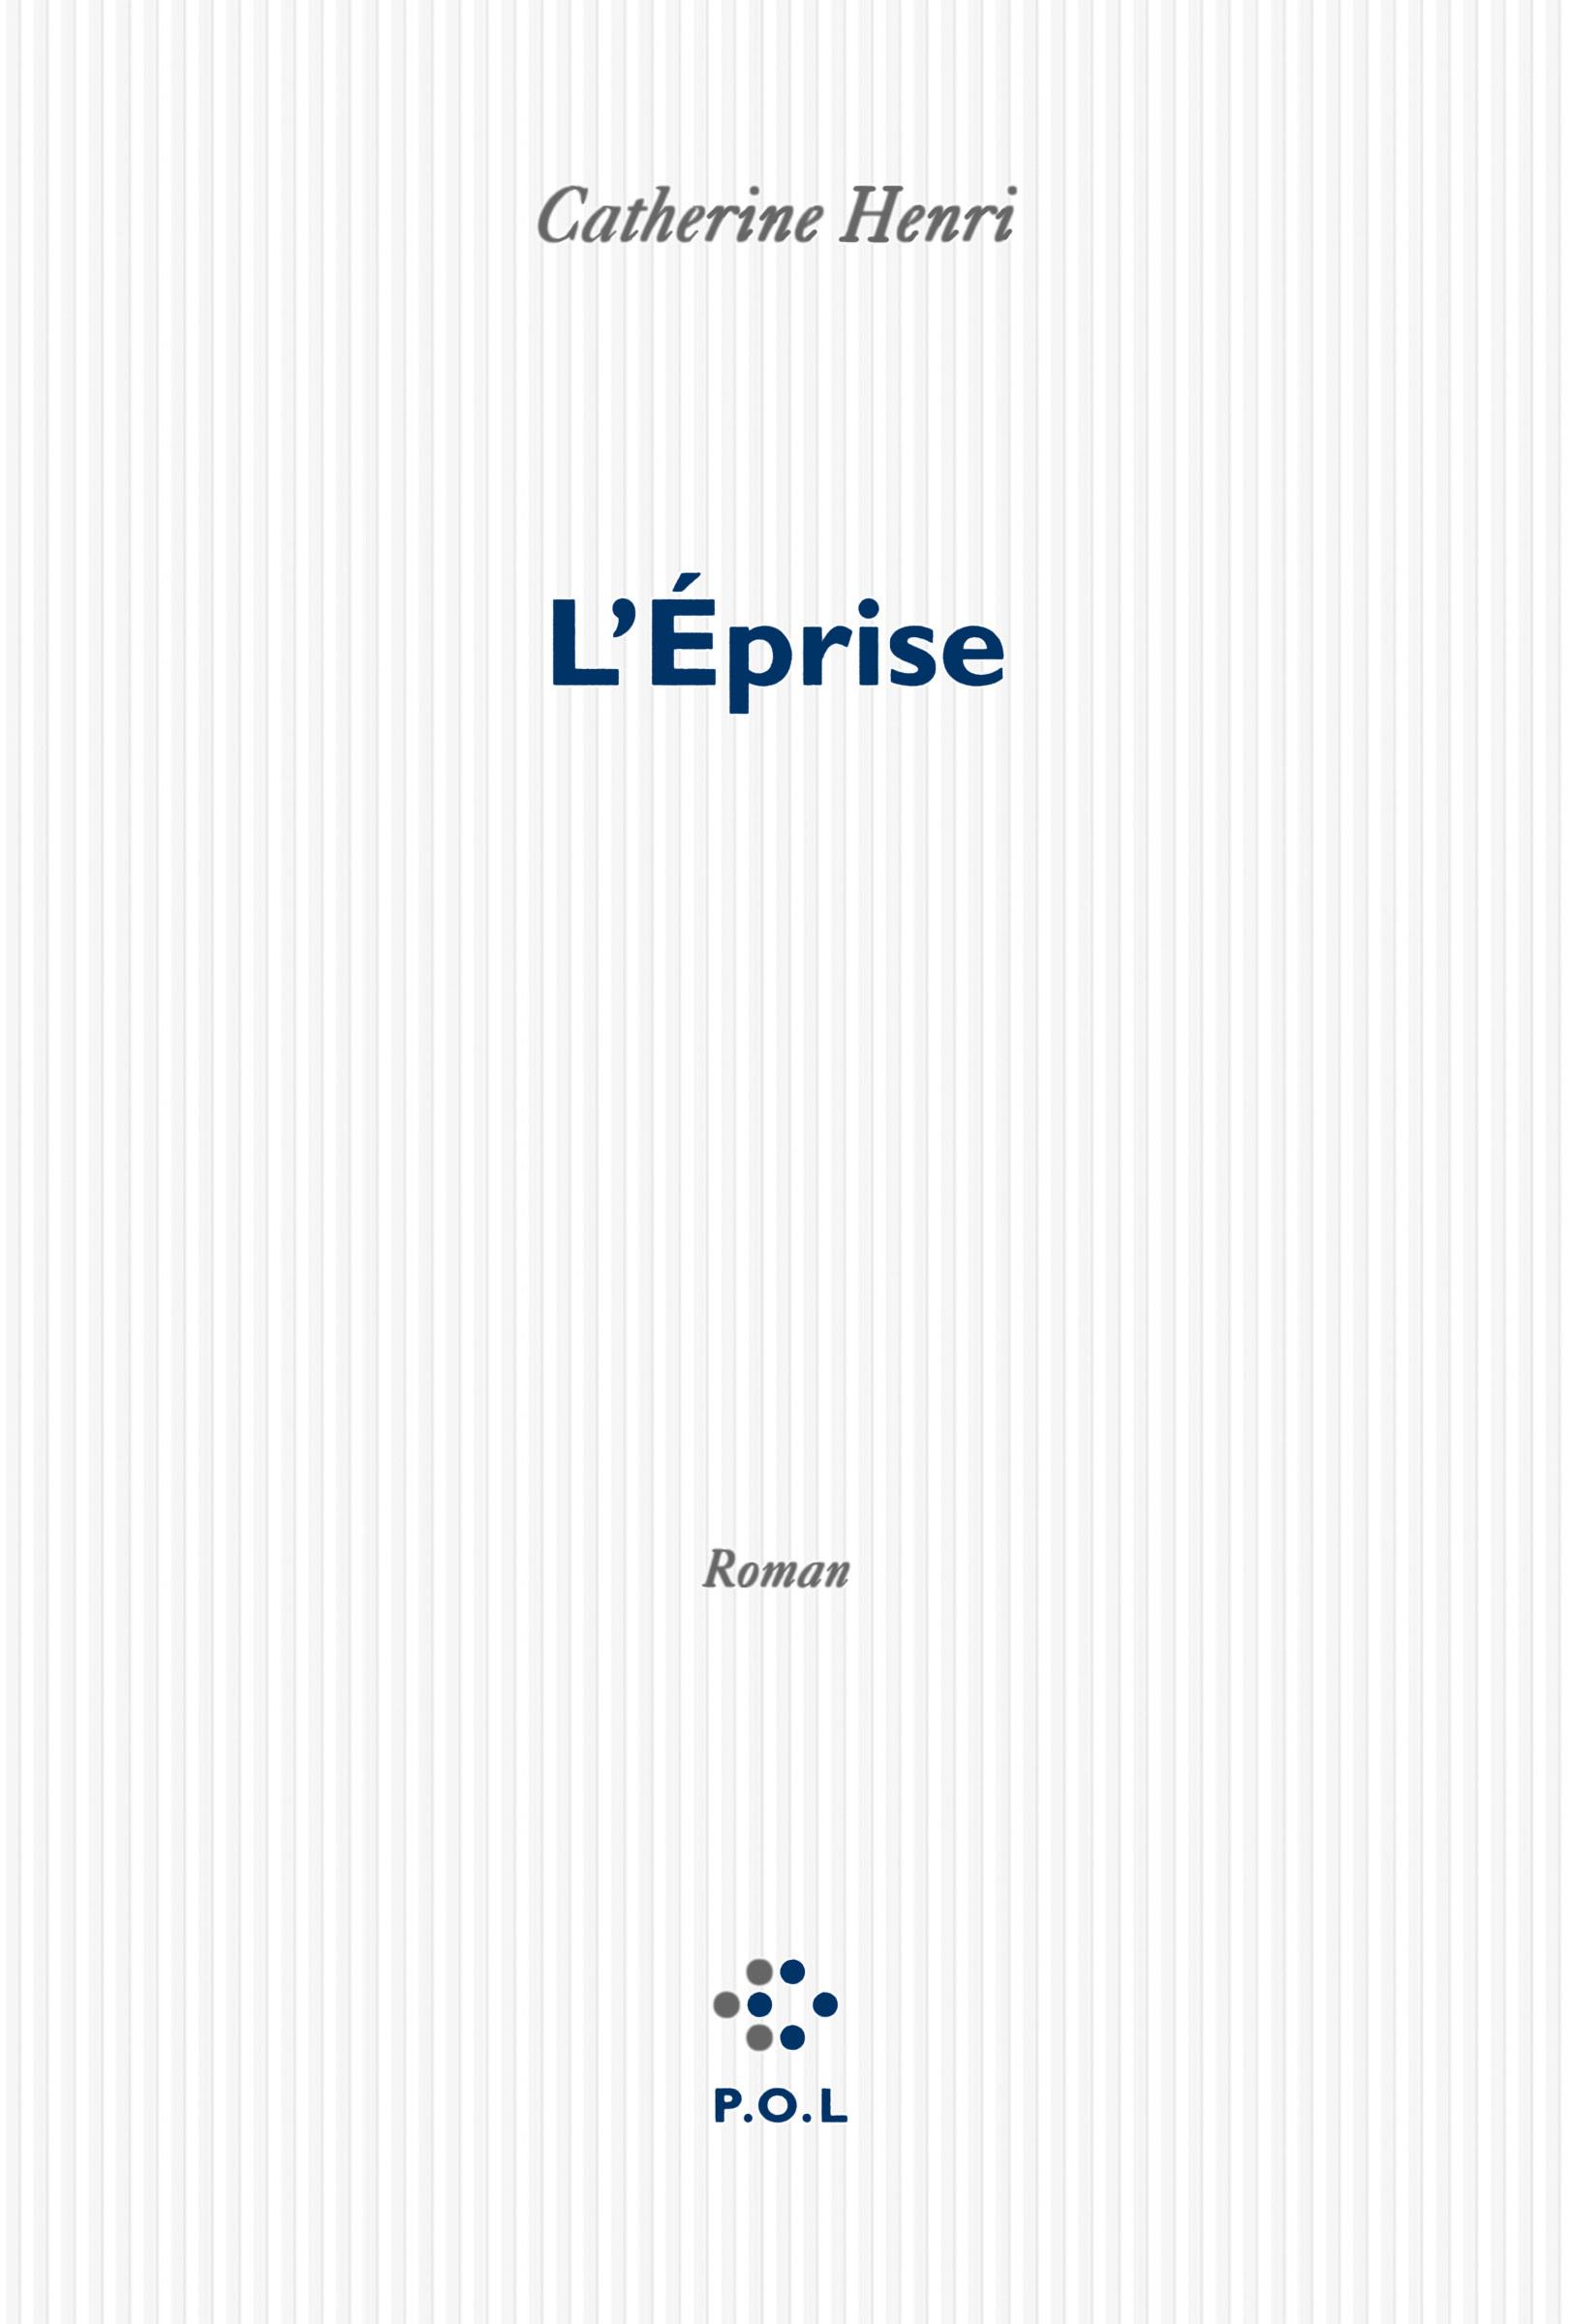 L'EPRISE